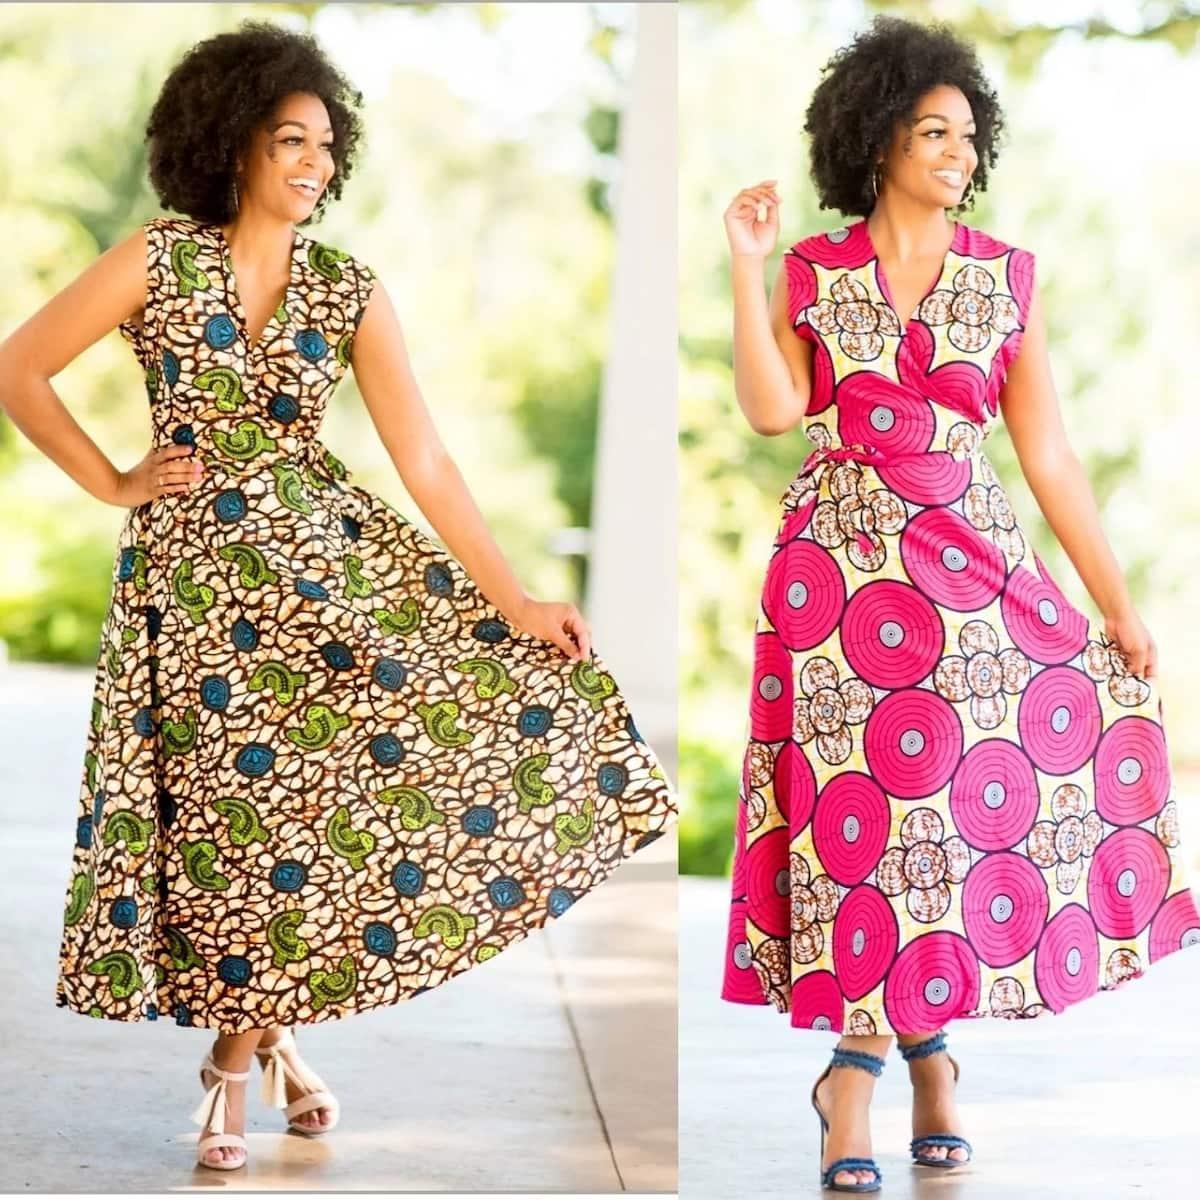 photos of african print dresses,african print dresses 2018 african print dresses styles